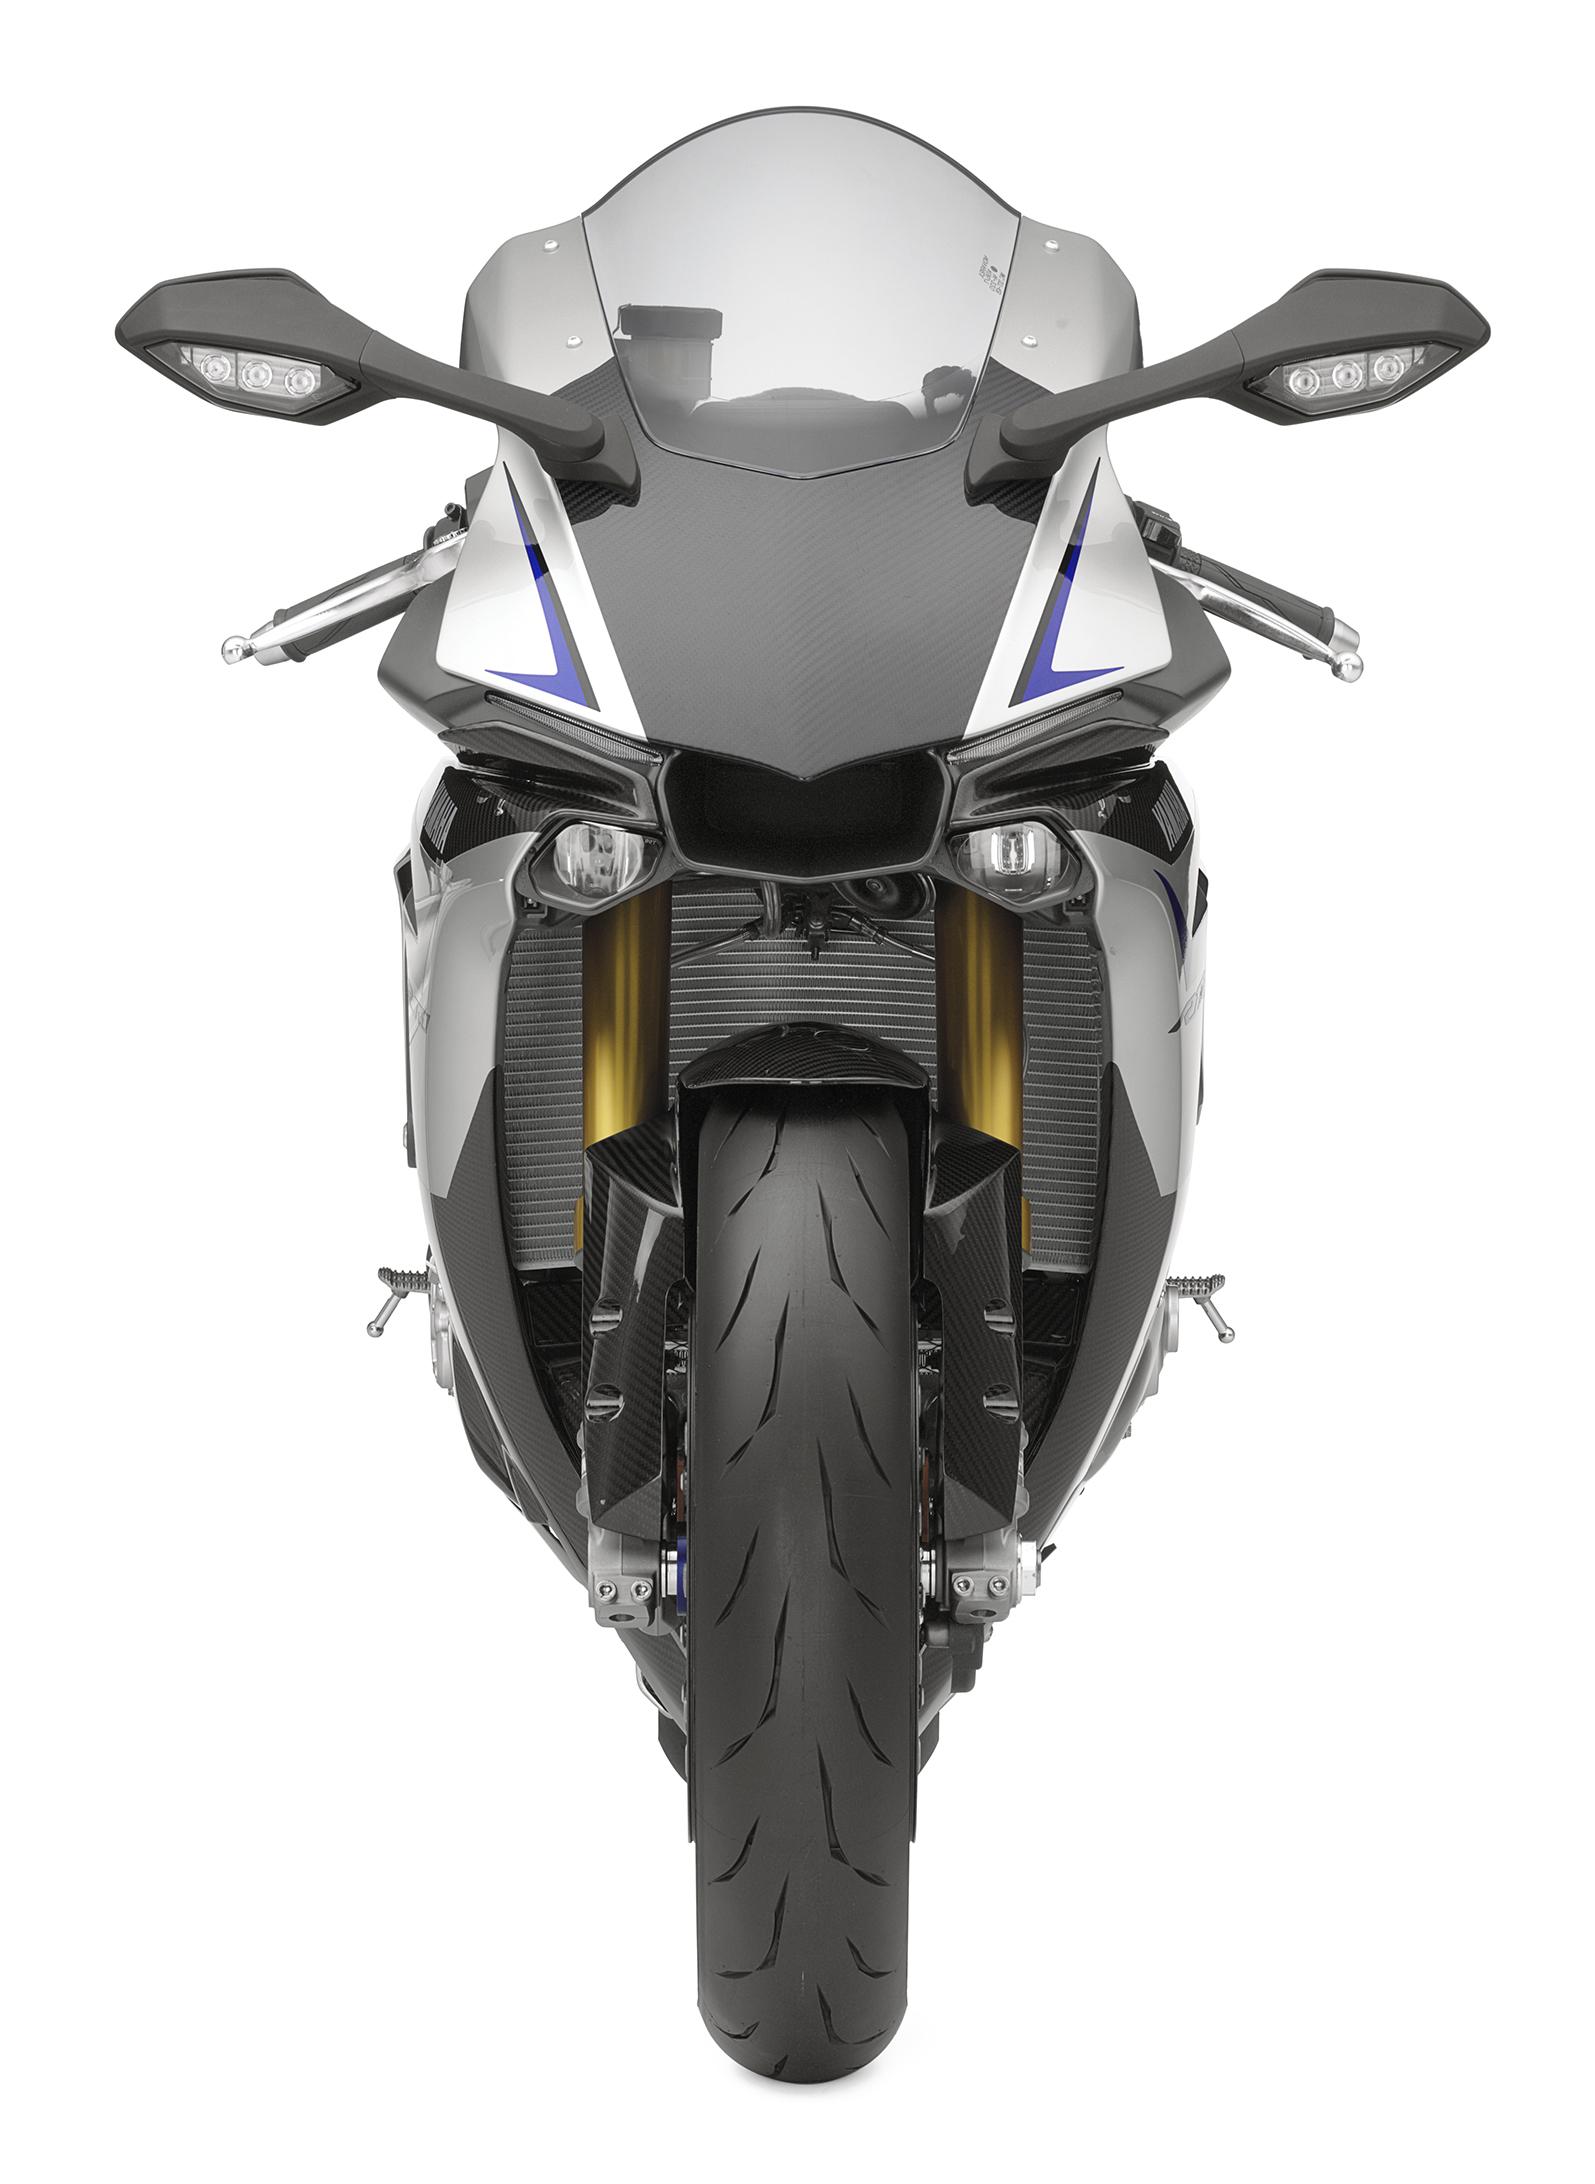 EICMA 2015 Yamaha YZF R1 And R1M